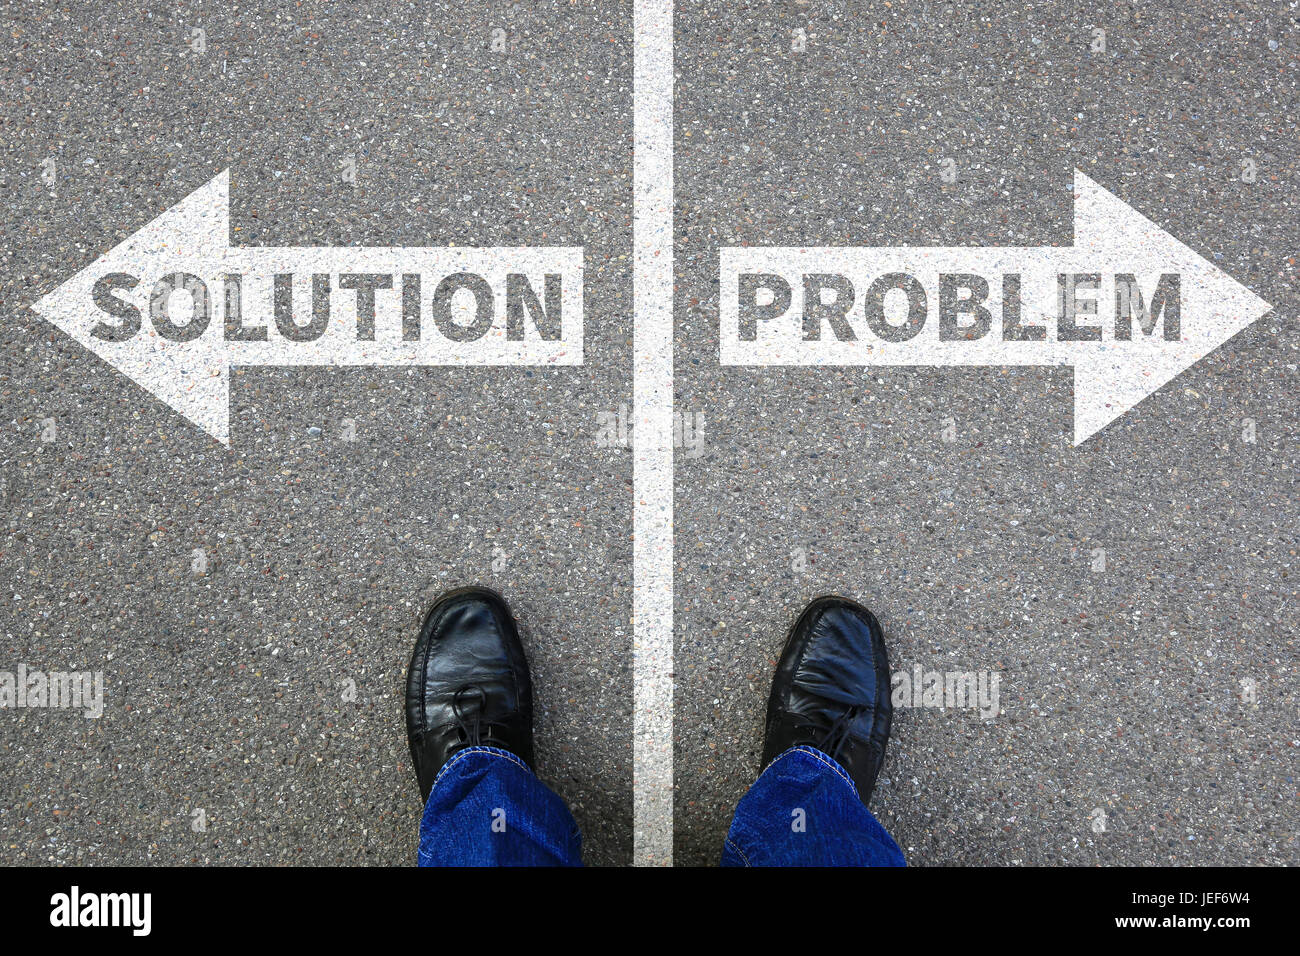 Finding solution problem businessman business concept problems success - Stock Image